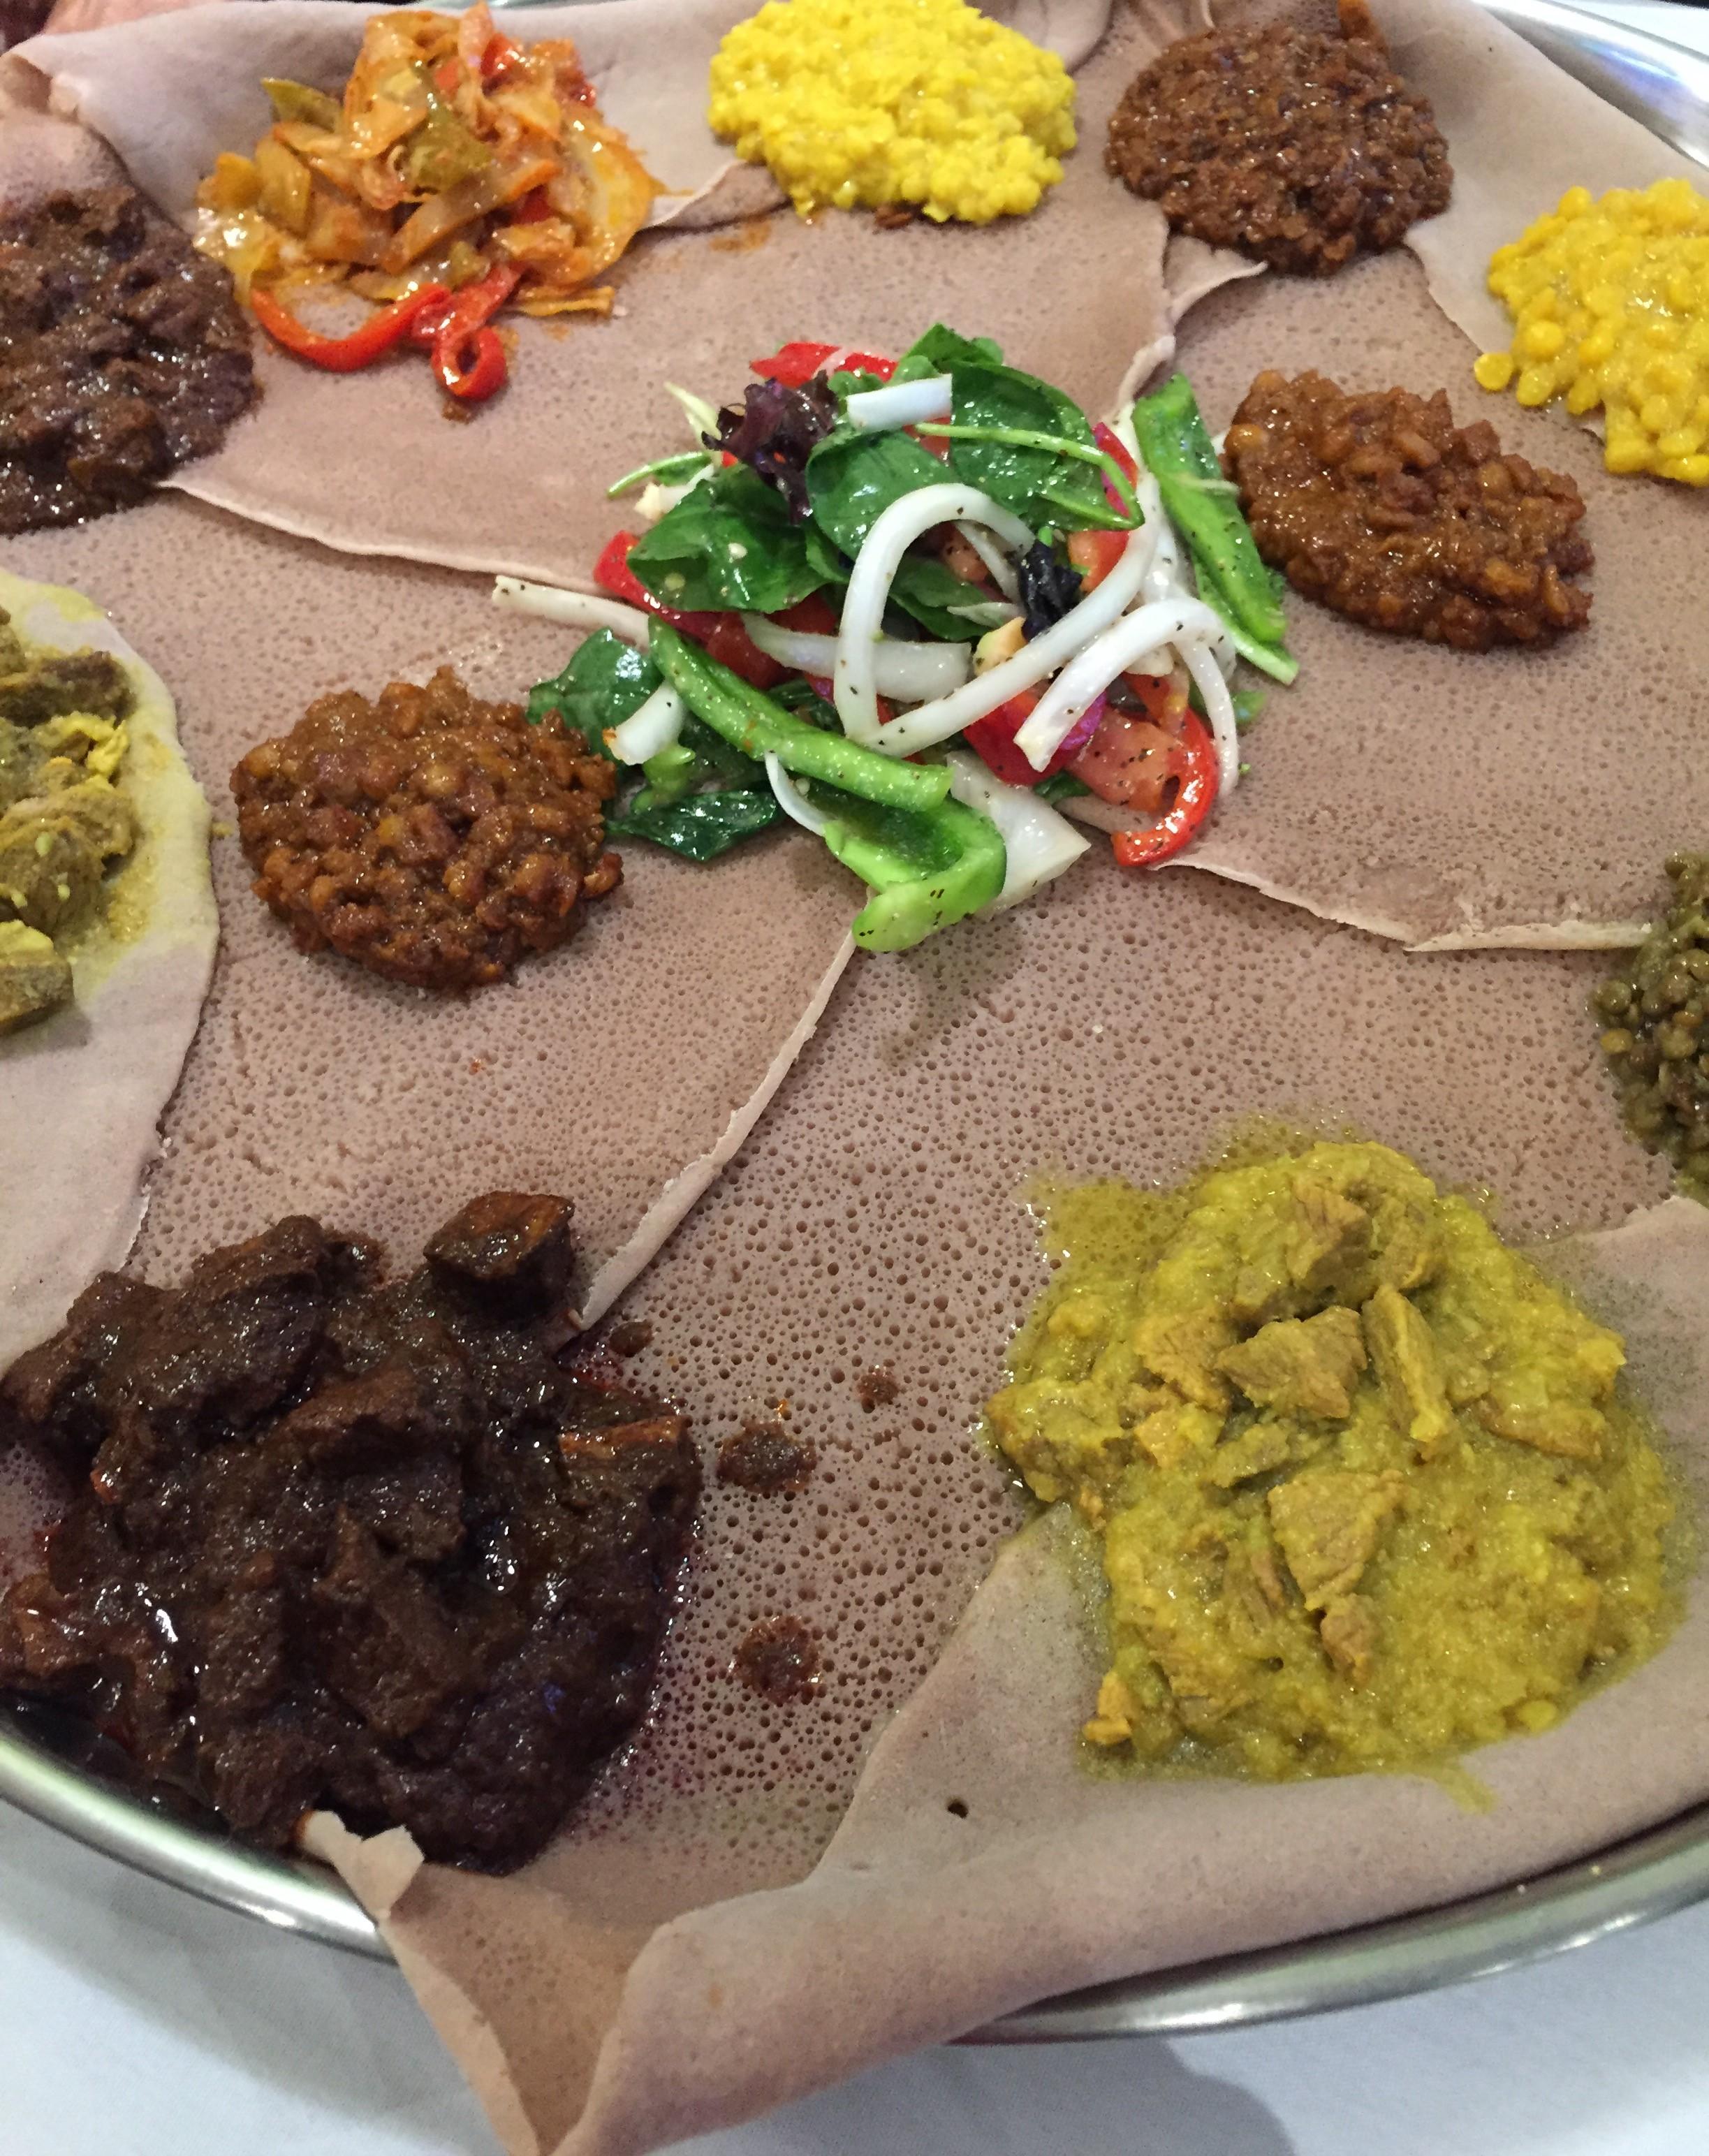 abyssina_ethiopian_food (4)